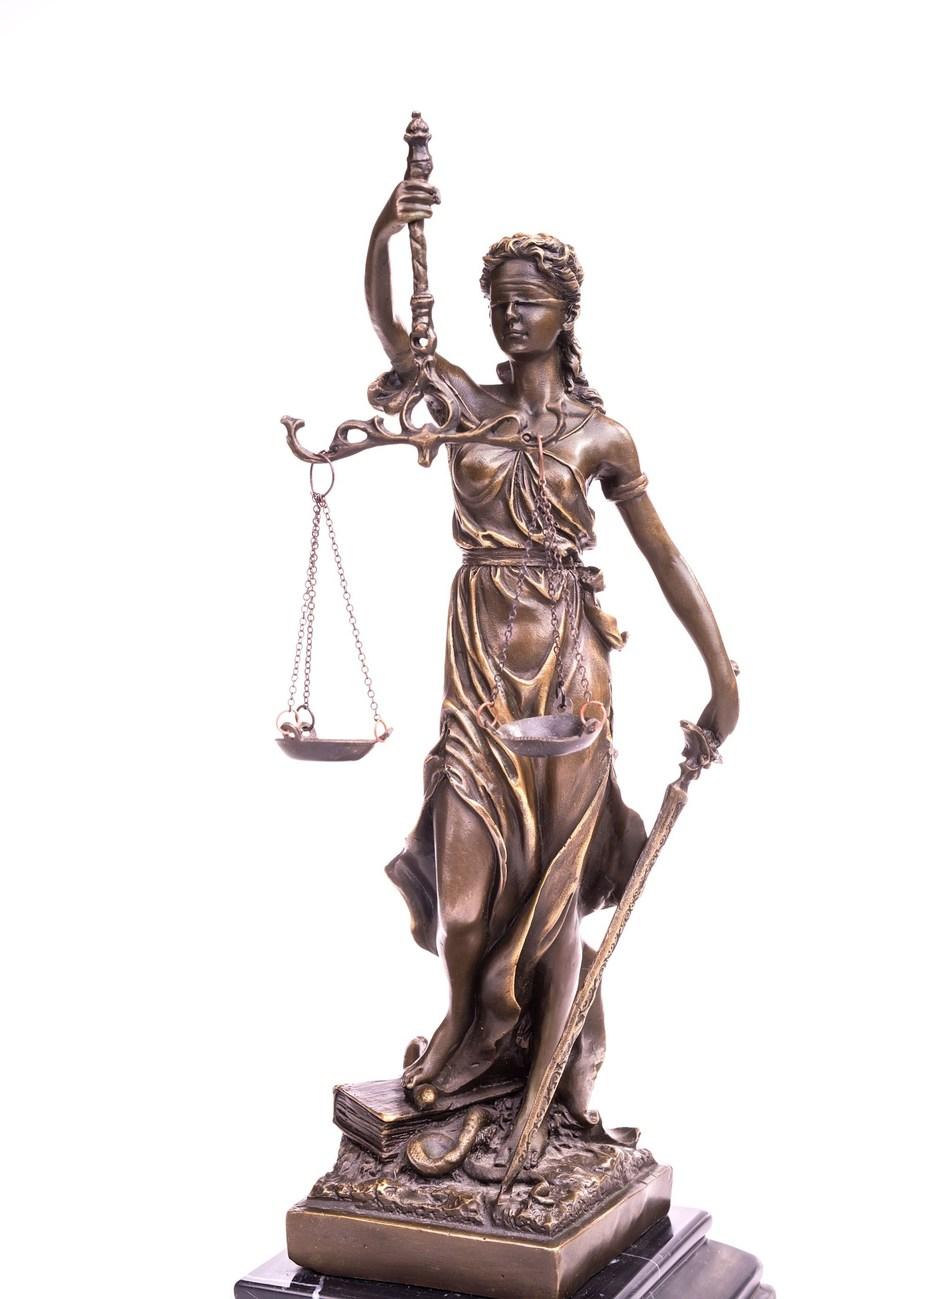 VSY filed opposition against Zeiss patent (PRNewsFoto/VSY Biotechnology)